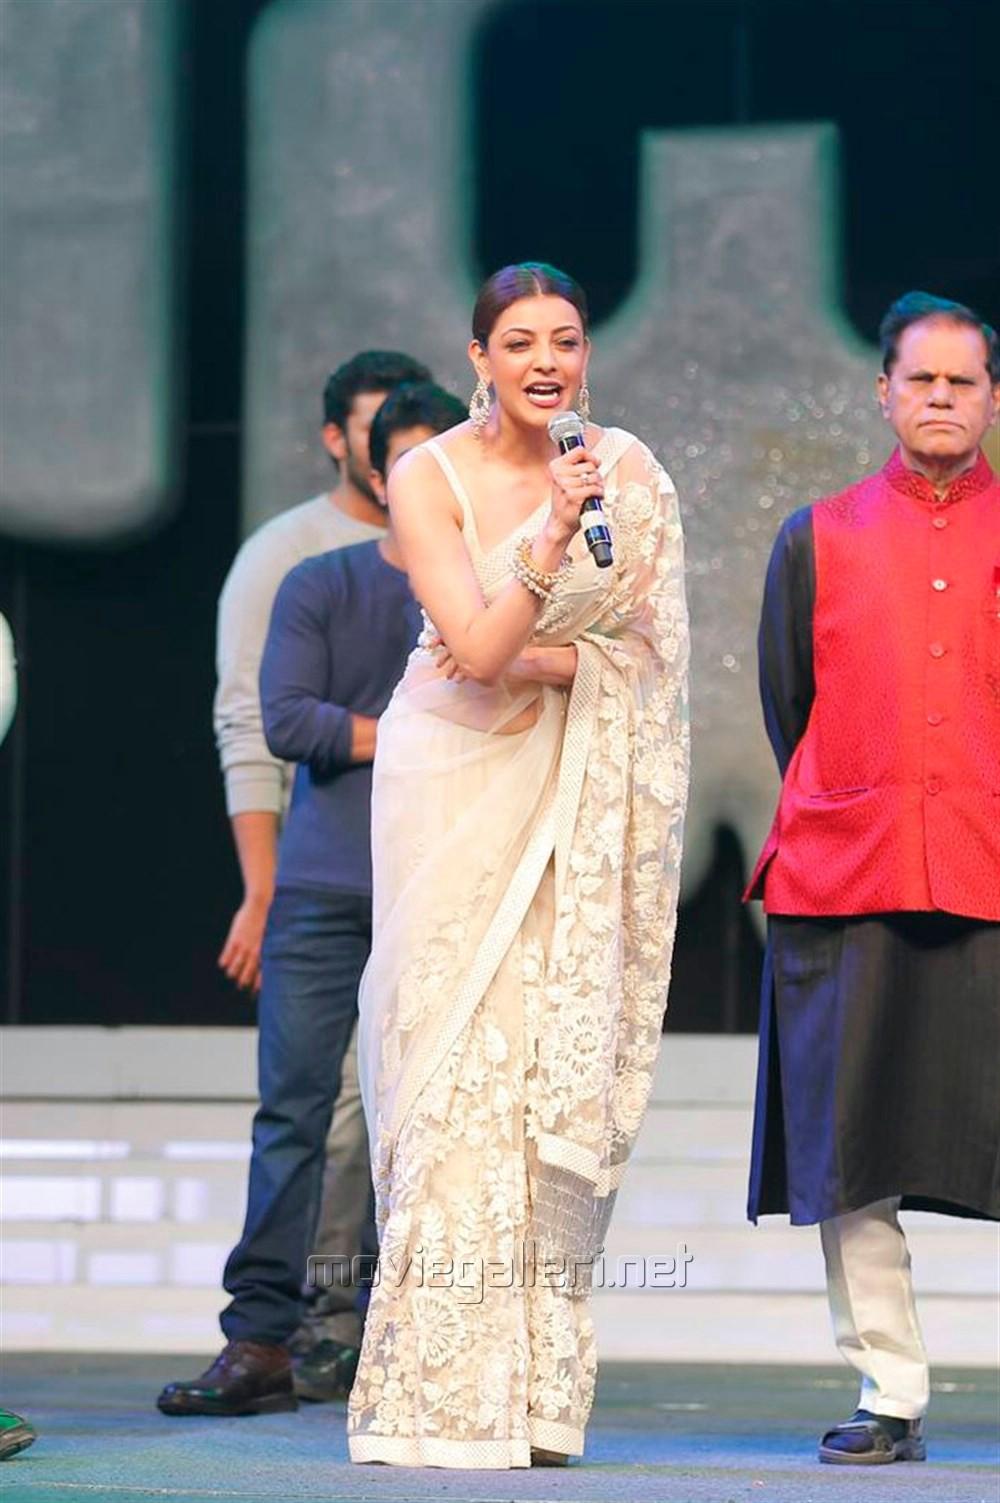 Kajal Aggarwal Looks Stunning in Cream Saree at Khiladi 150 Pre Release Event Jnaury 2017